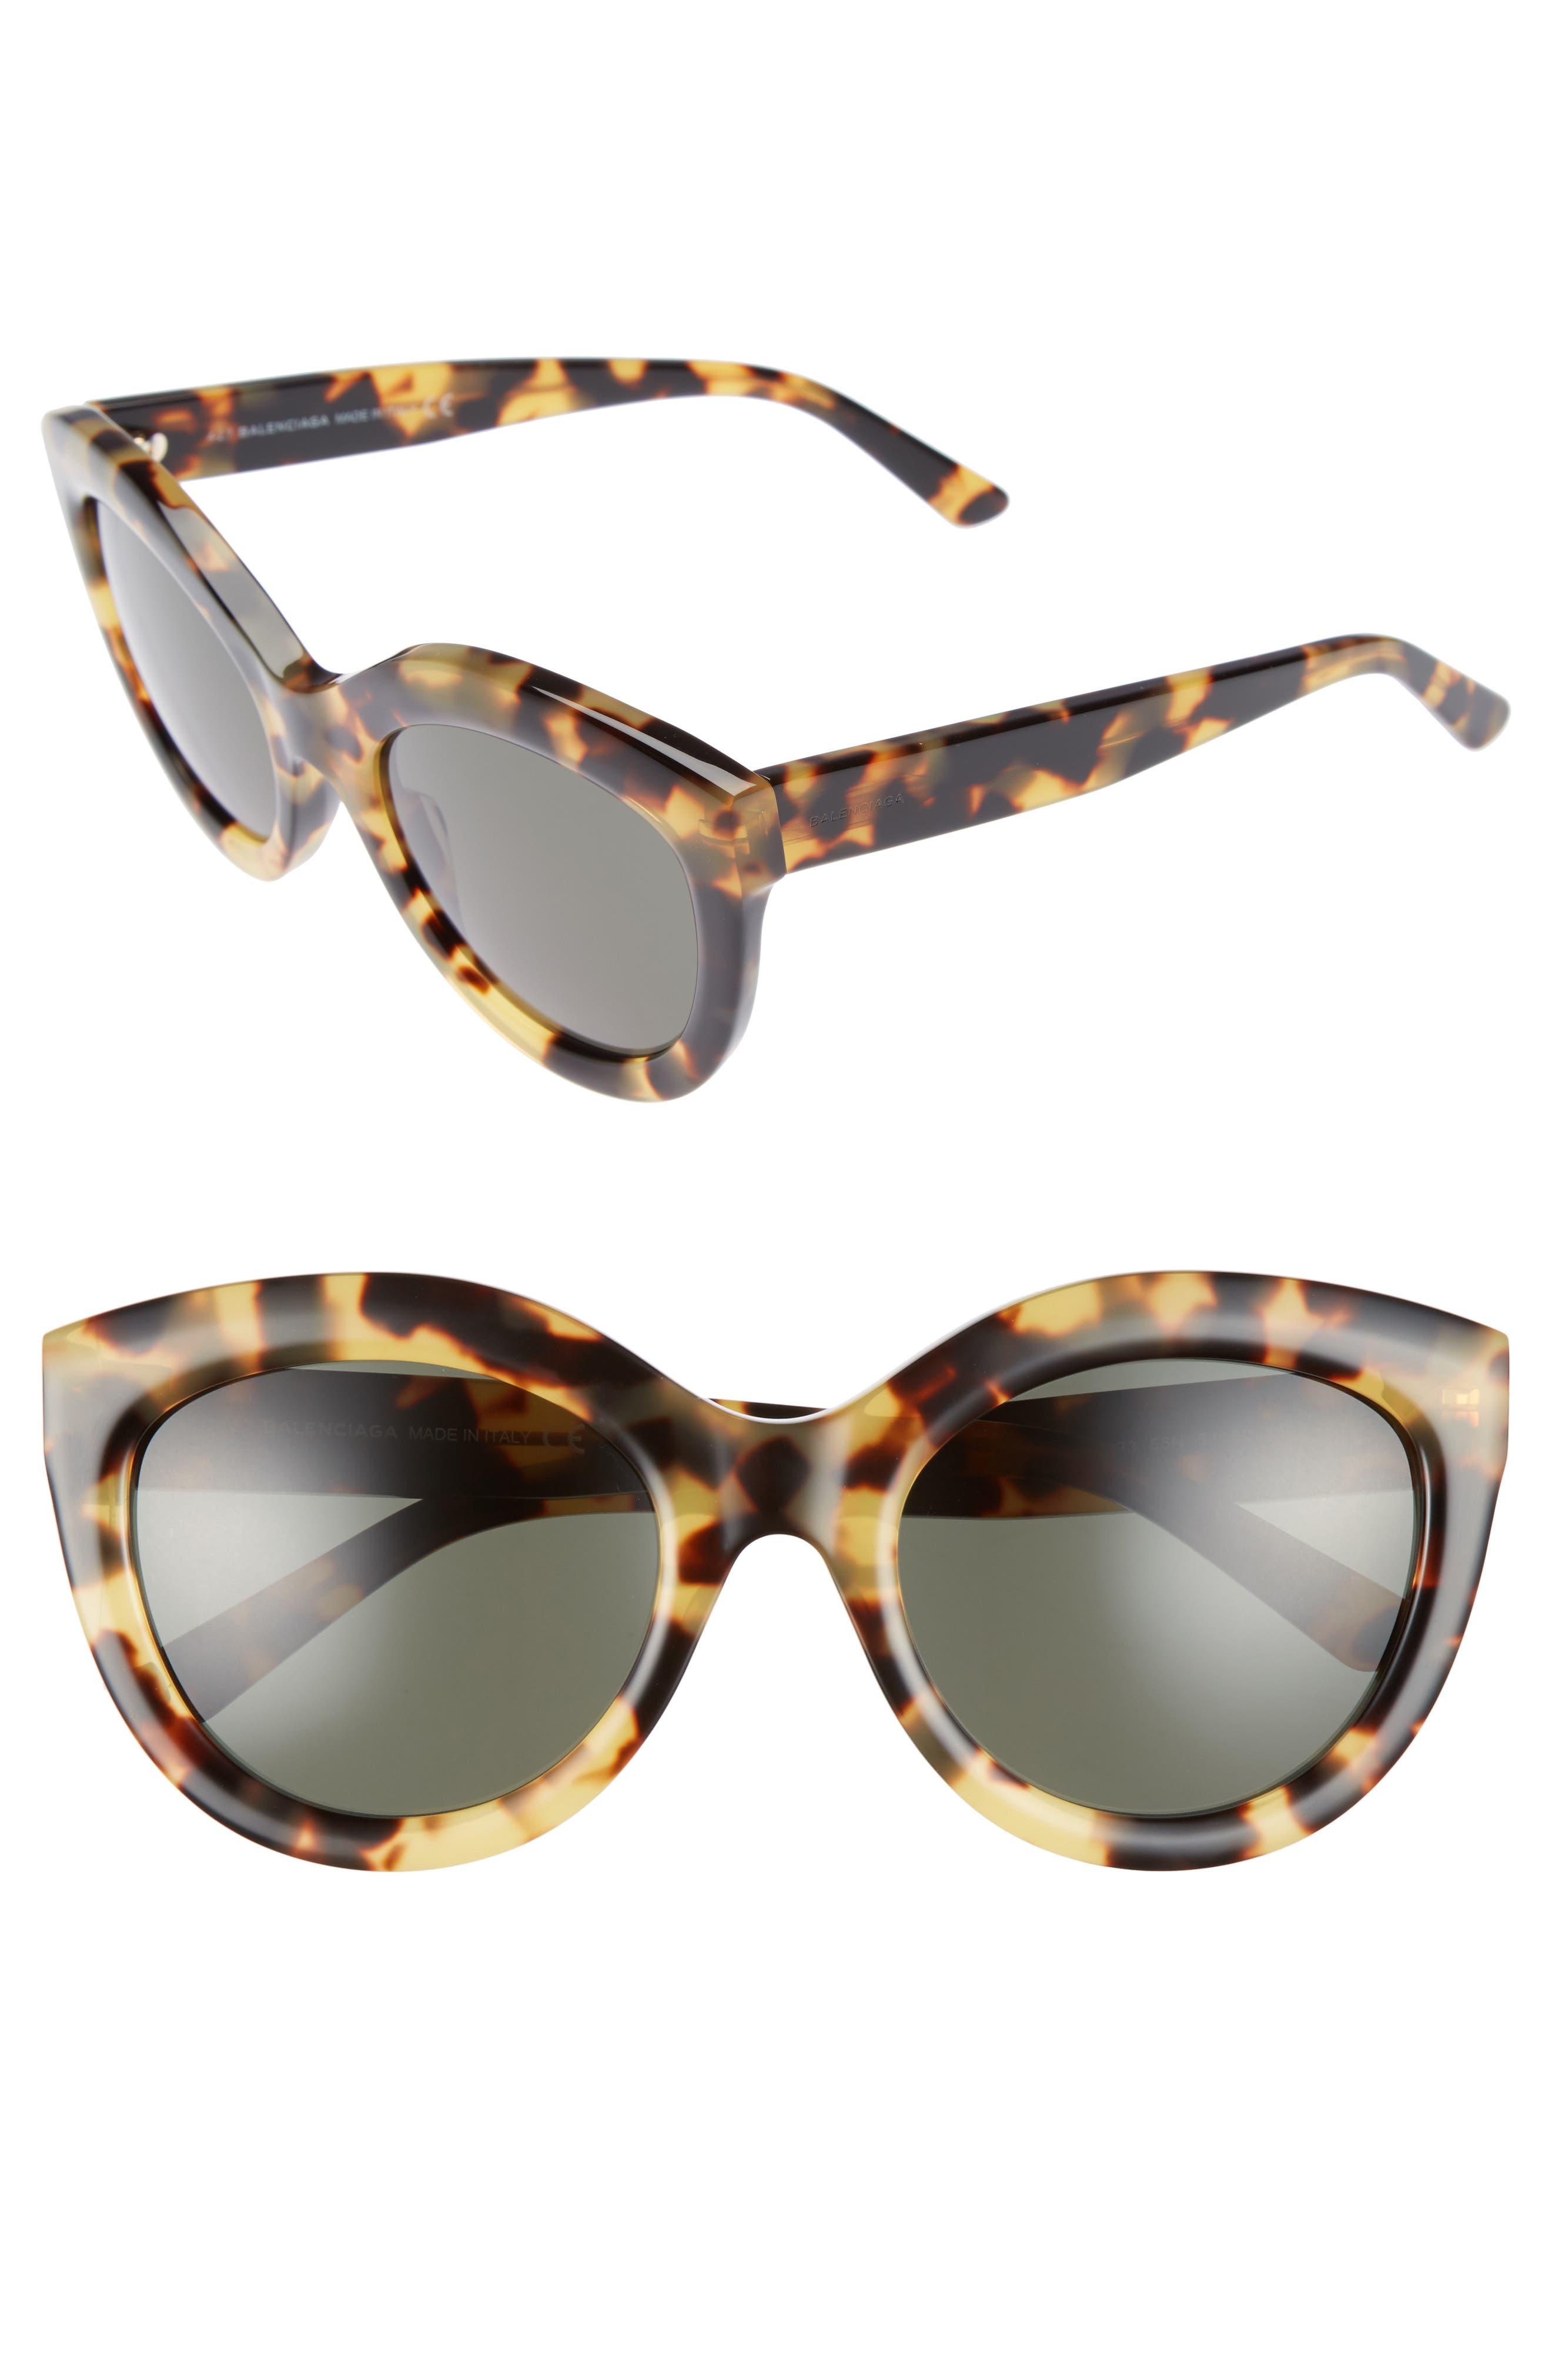 54mm Cat Eye Sunglasses,                         Main,                         color, 200